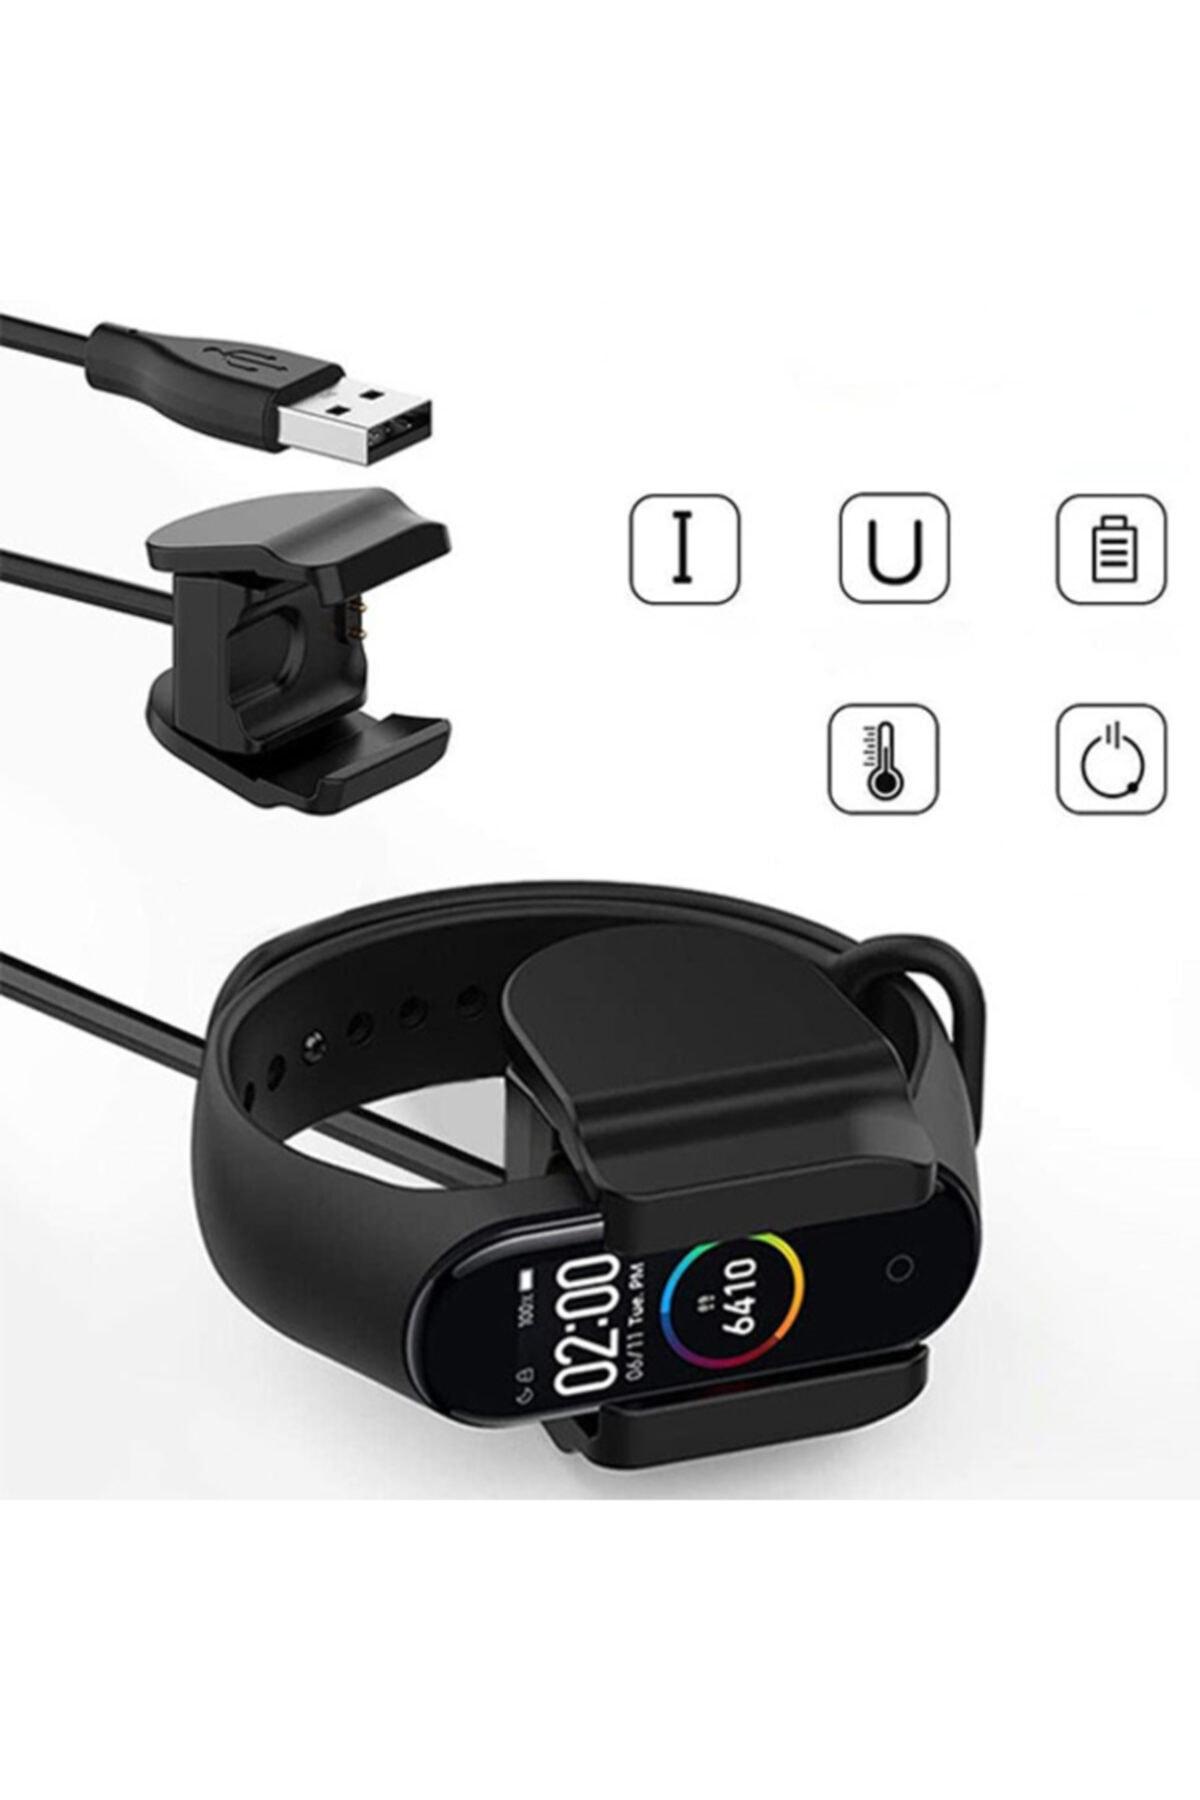 Ally Xiaomi Mi Band 5 Usb Şarj Cihazı Kablosu-mi Band 5 Şarj Aleti 1